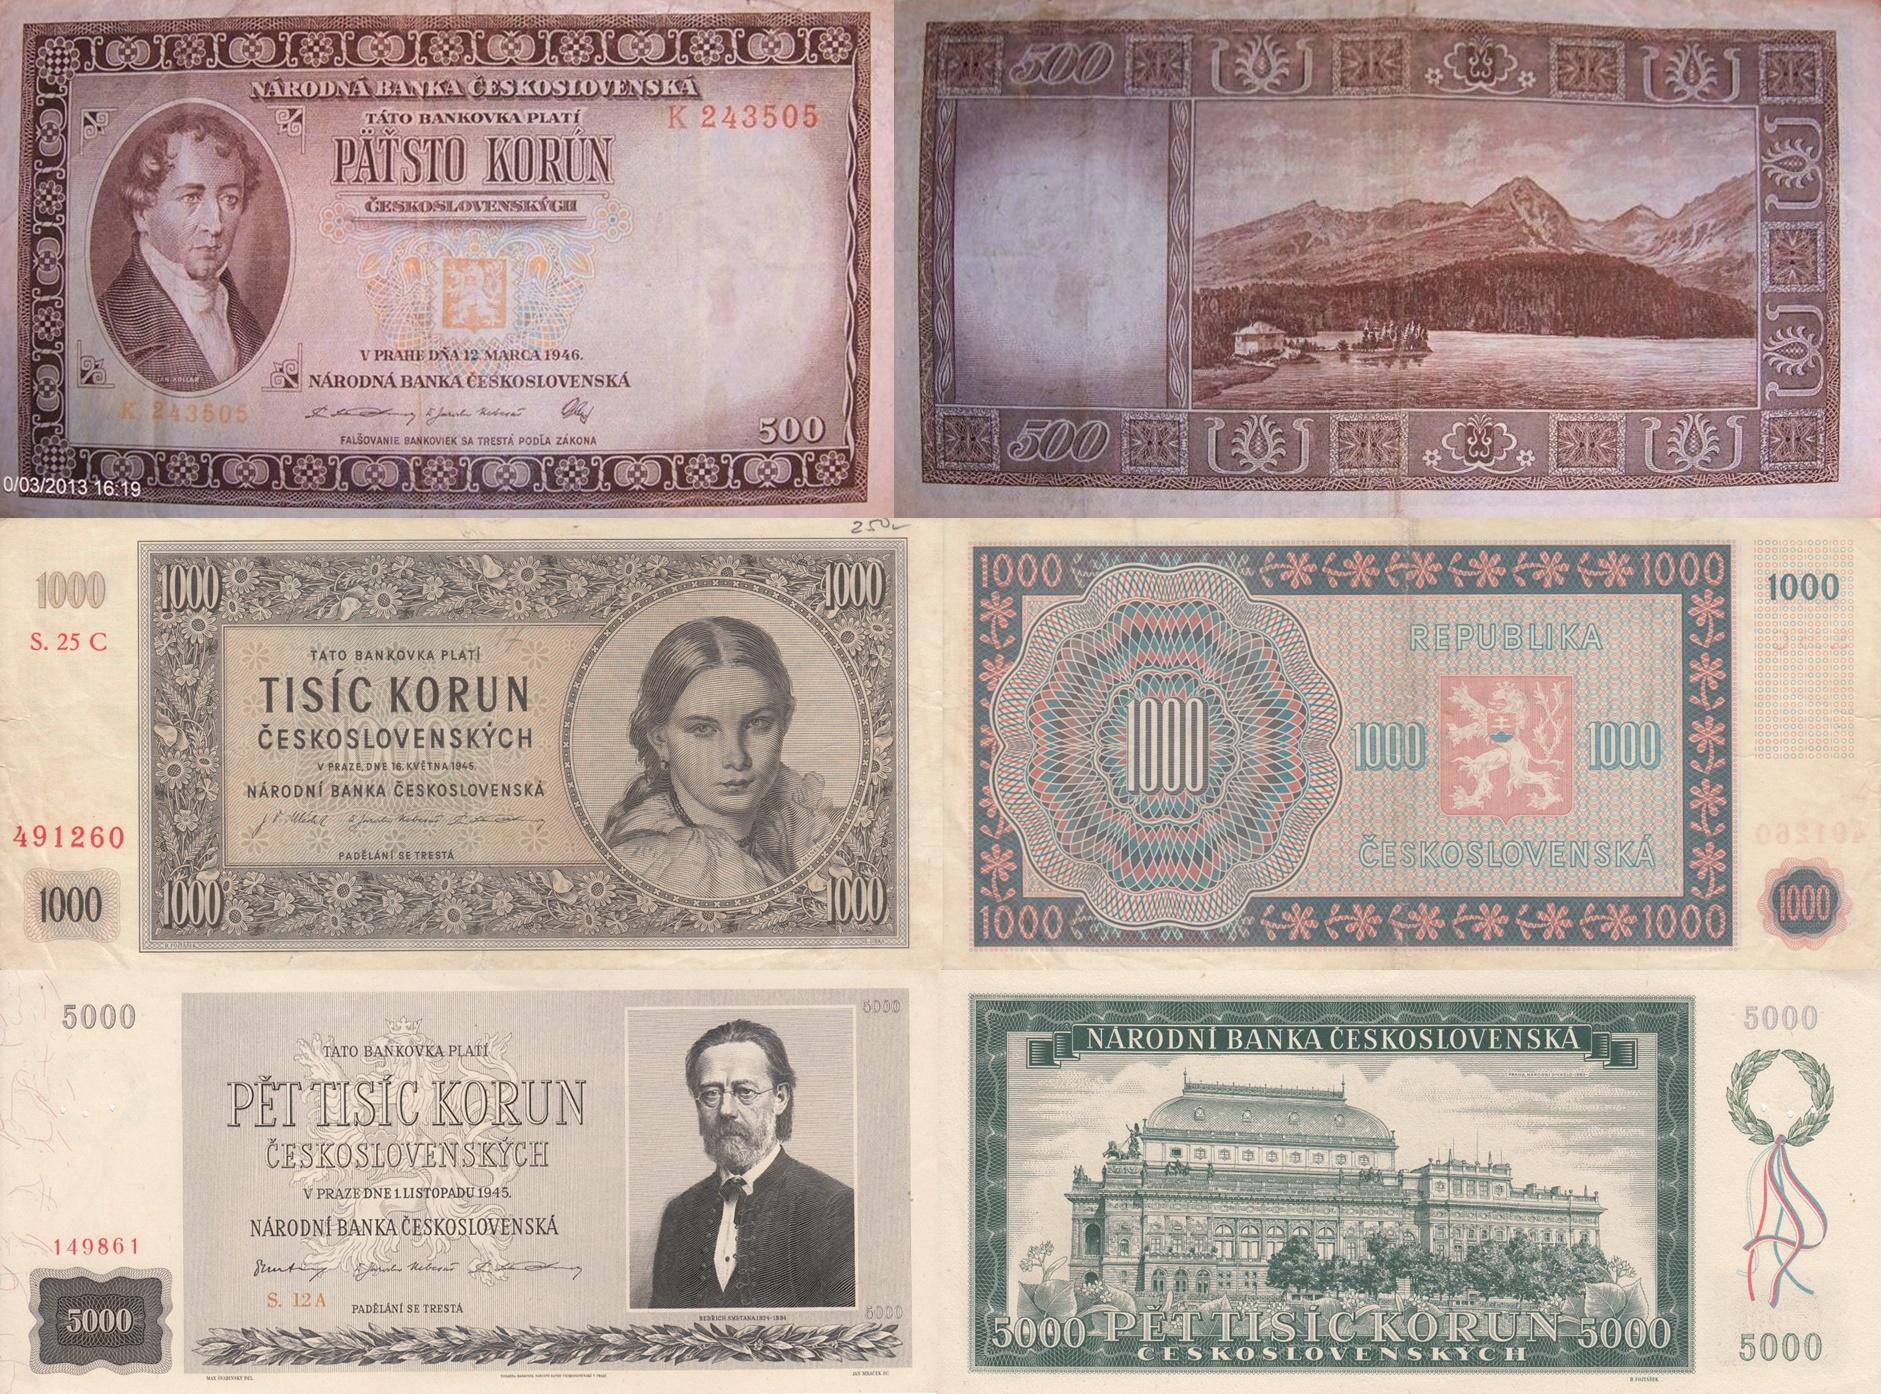 Emisiunea 1945-1946 - (Narodni(a) Banka Ceskoslovenská)